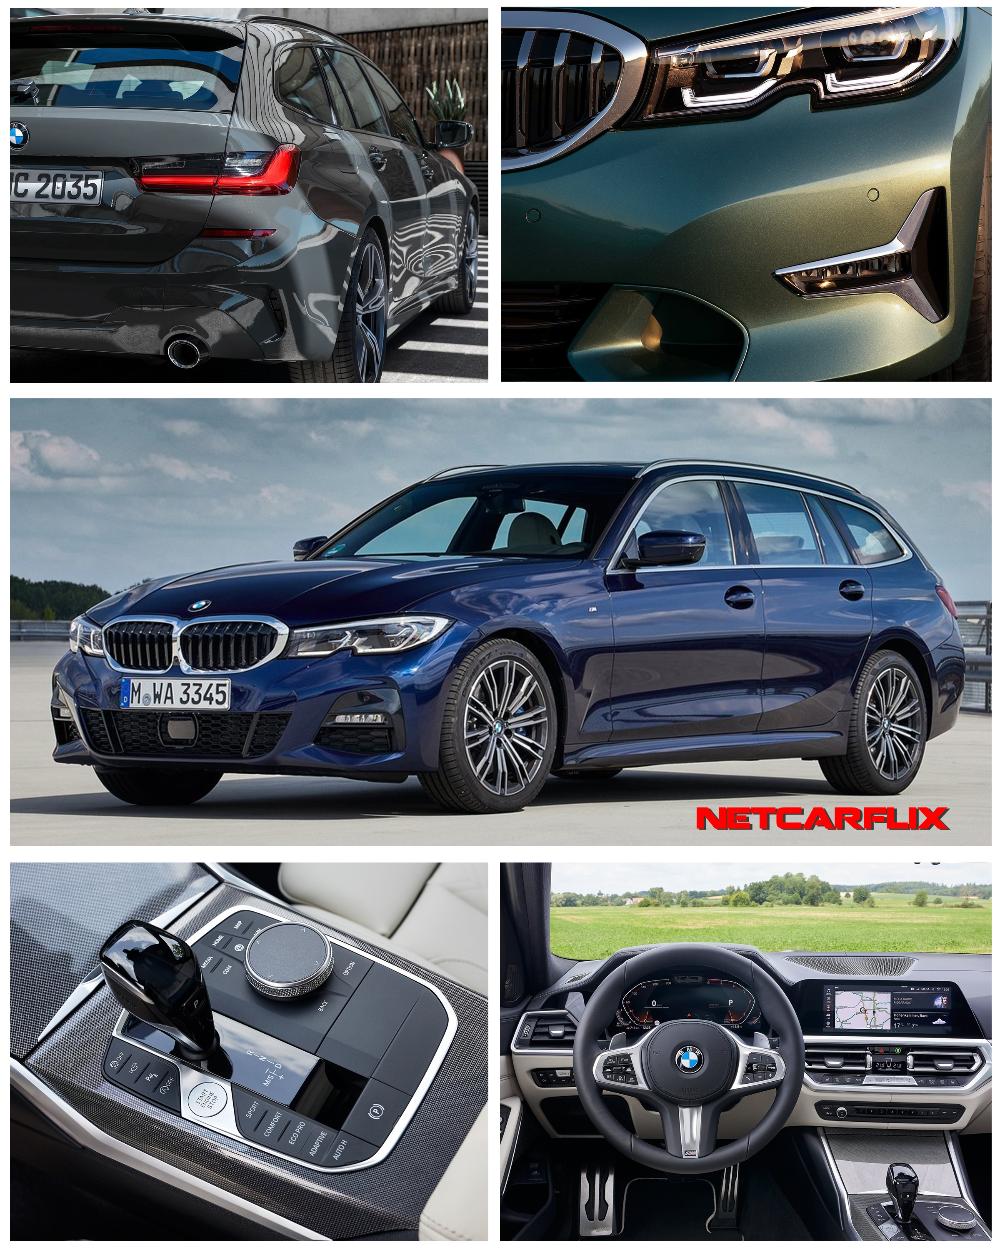 2020 BMW 3-Series Touring - Dailyrevs